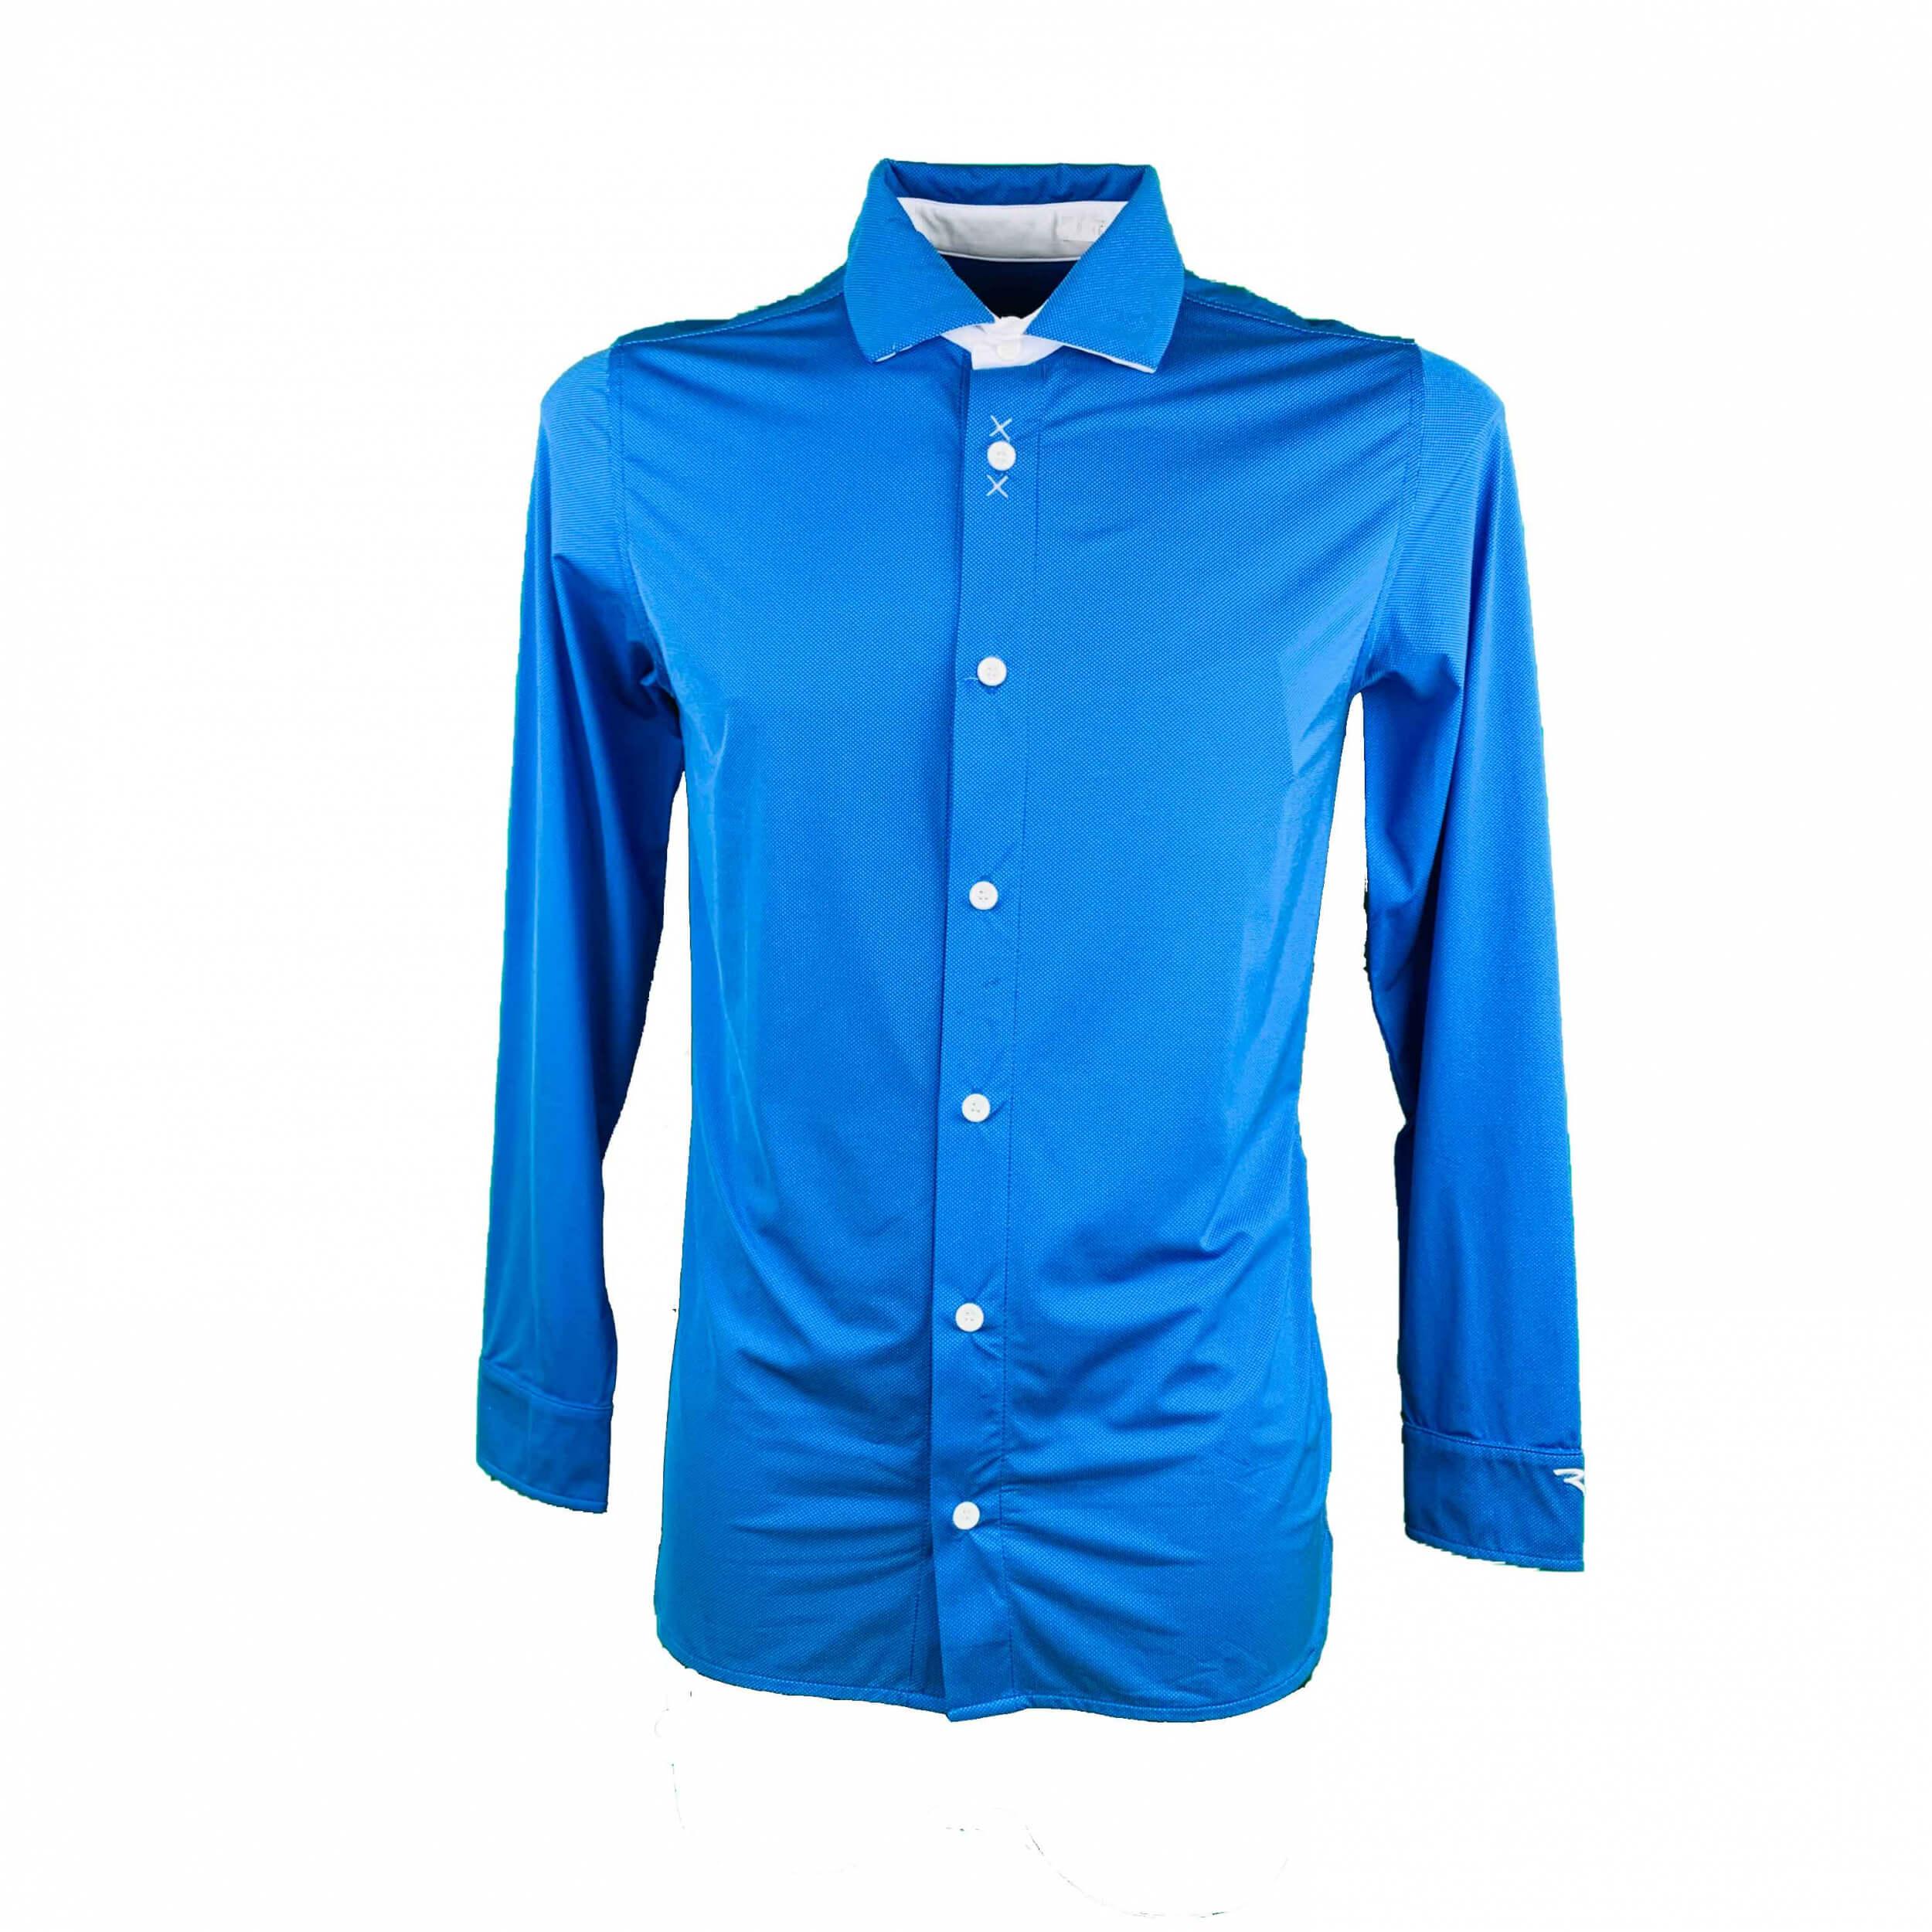 Chervo Herren lang Arm Hemd Davide DRY MATIC blau 2.Wahl